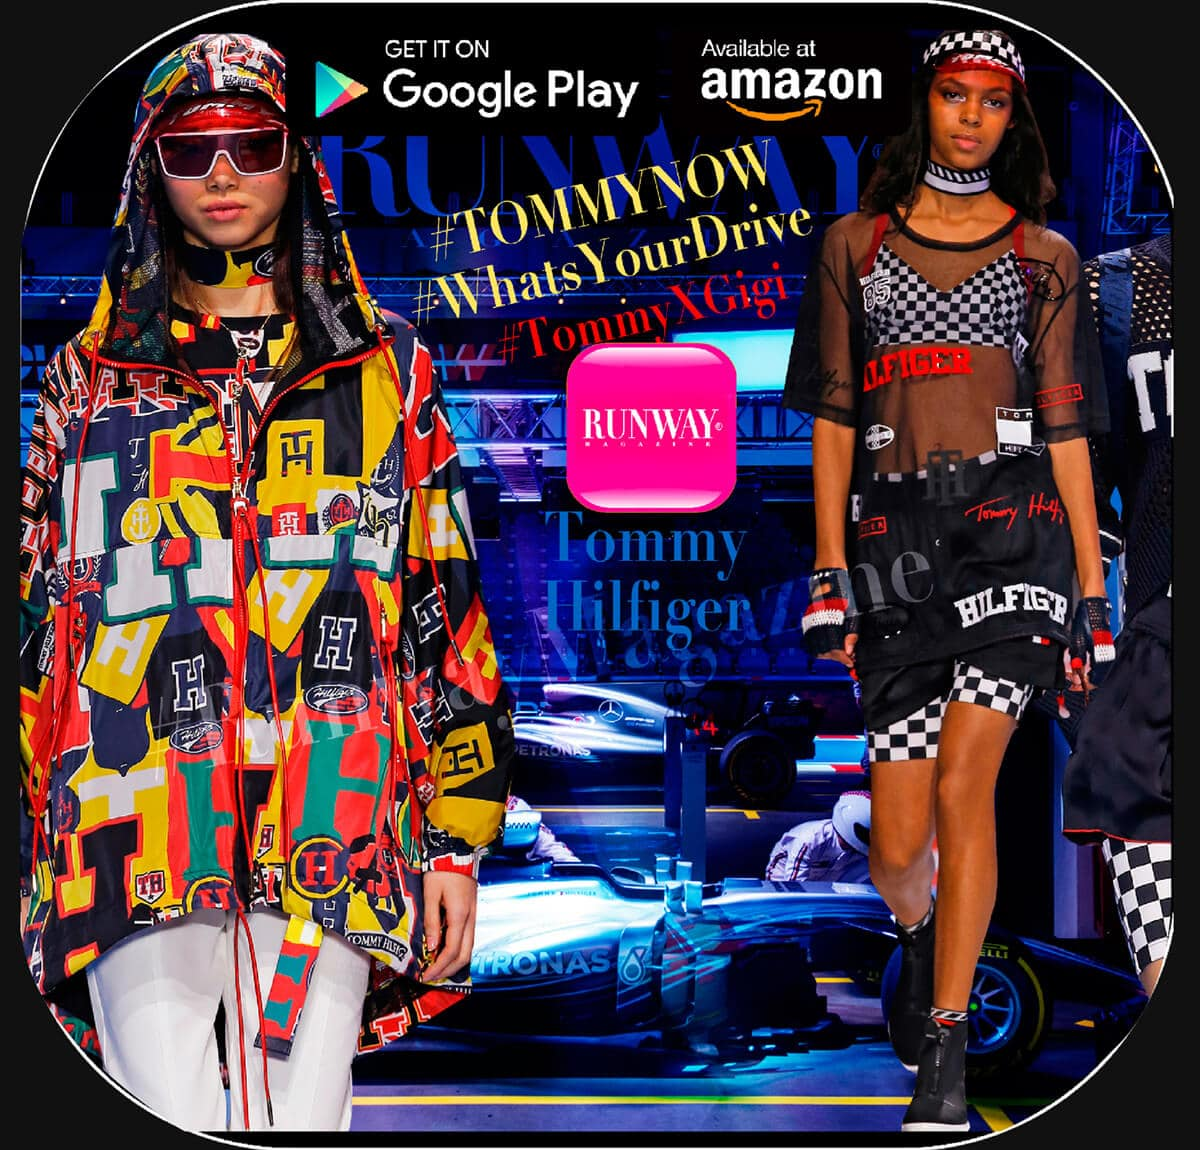 Runway Magazine application on google play